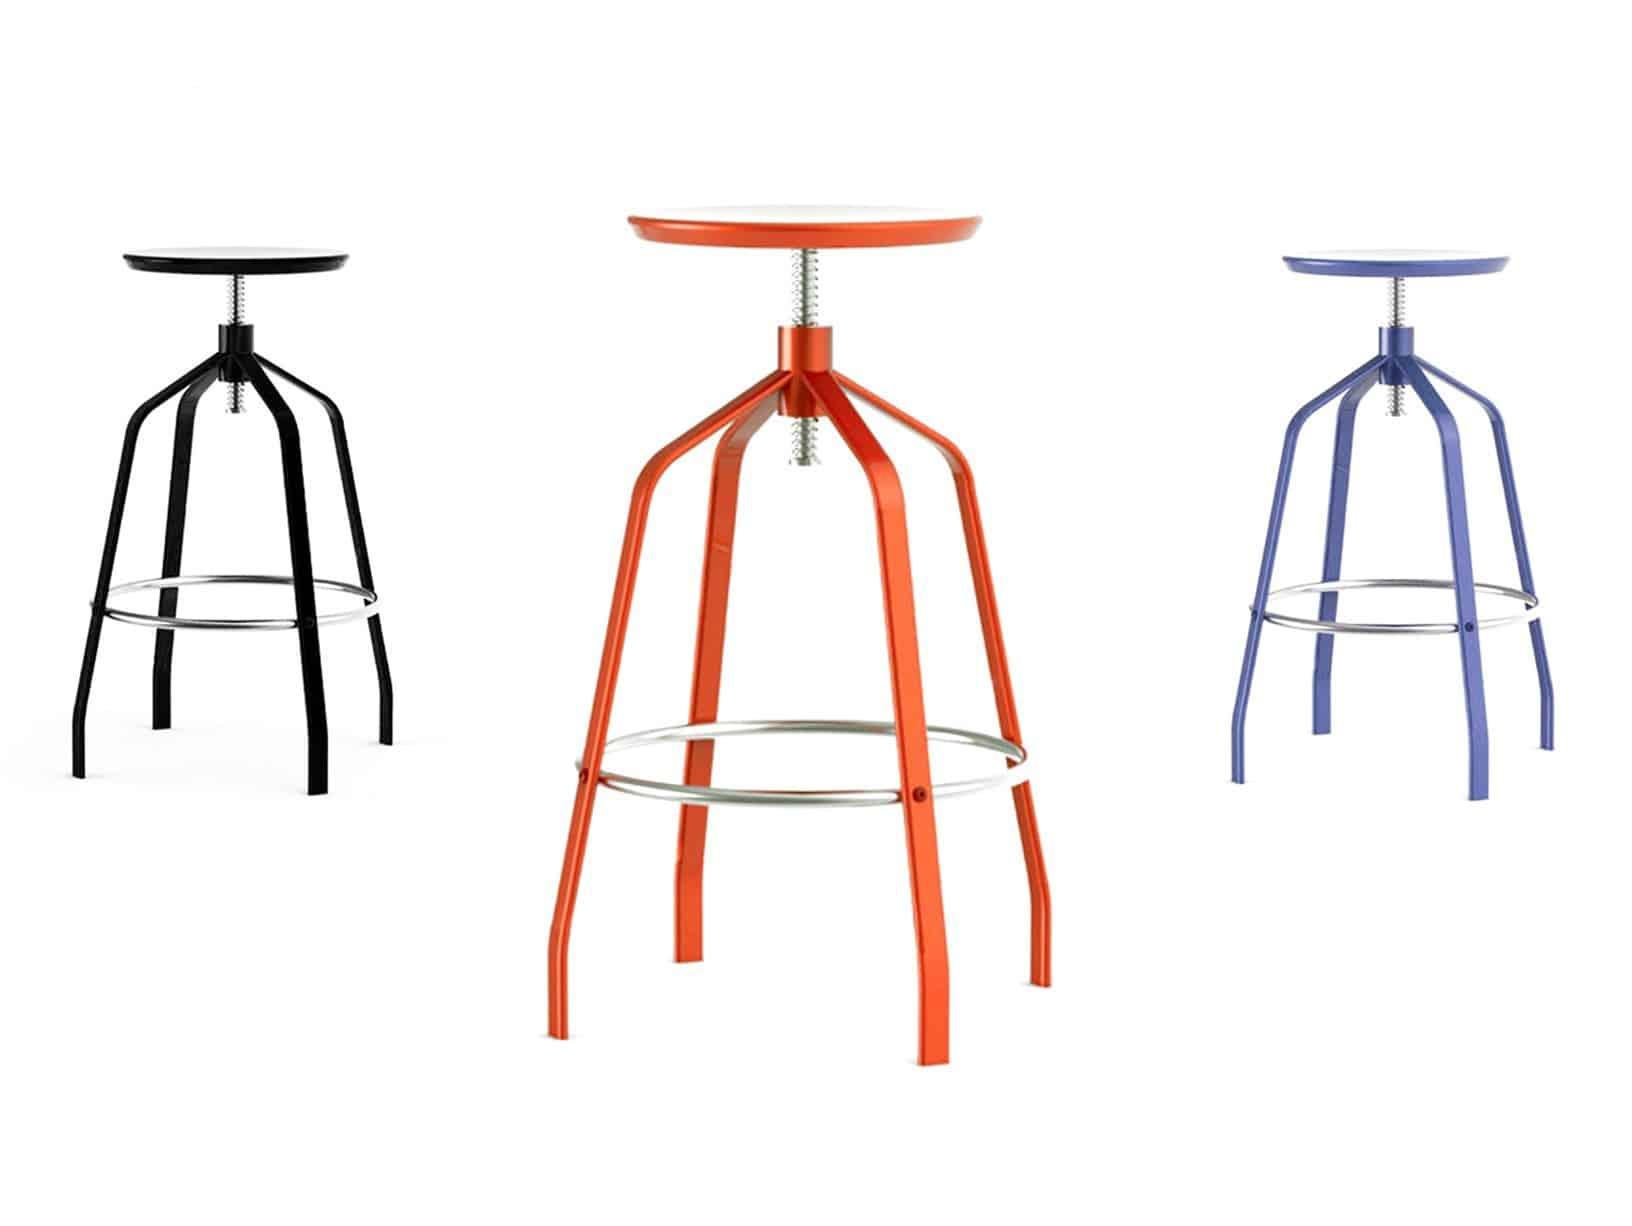 Attirant Elegant Minimalist Adjustable Height Bar Stool   Vito By Area Declic